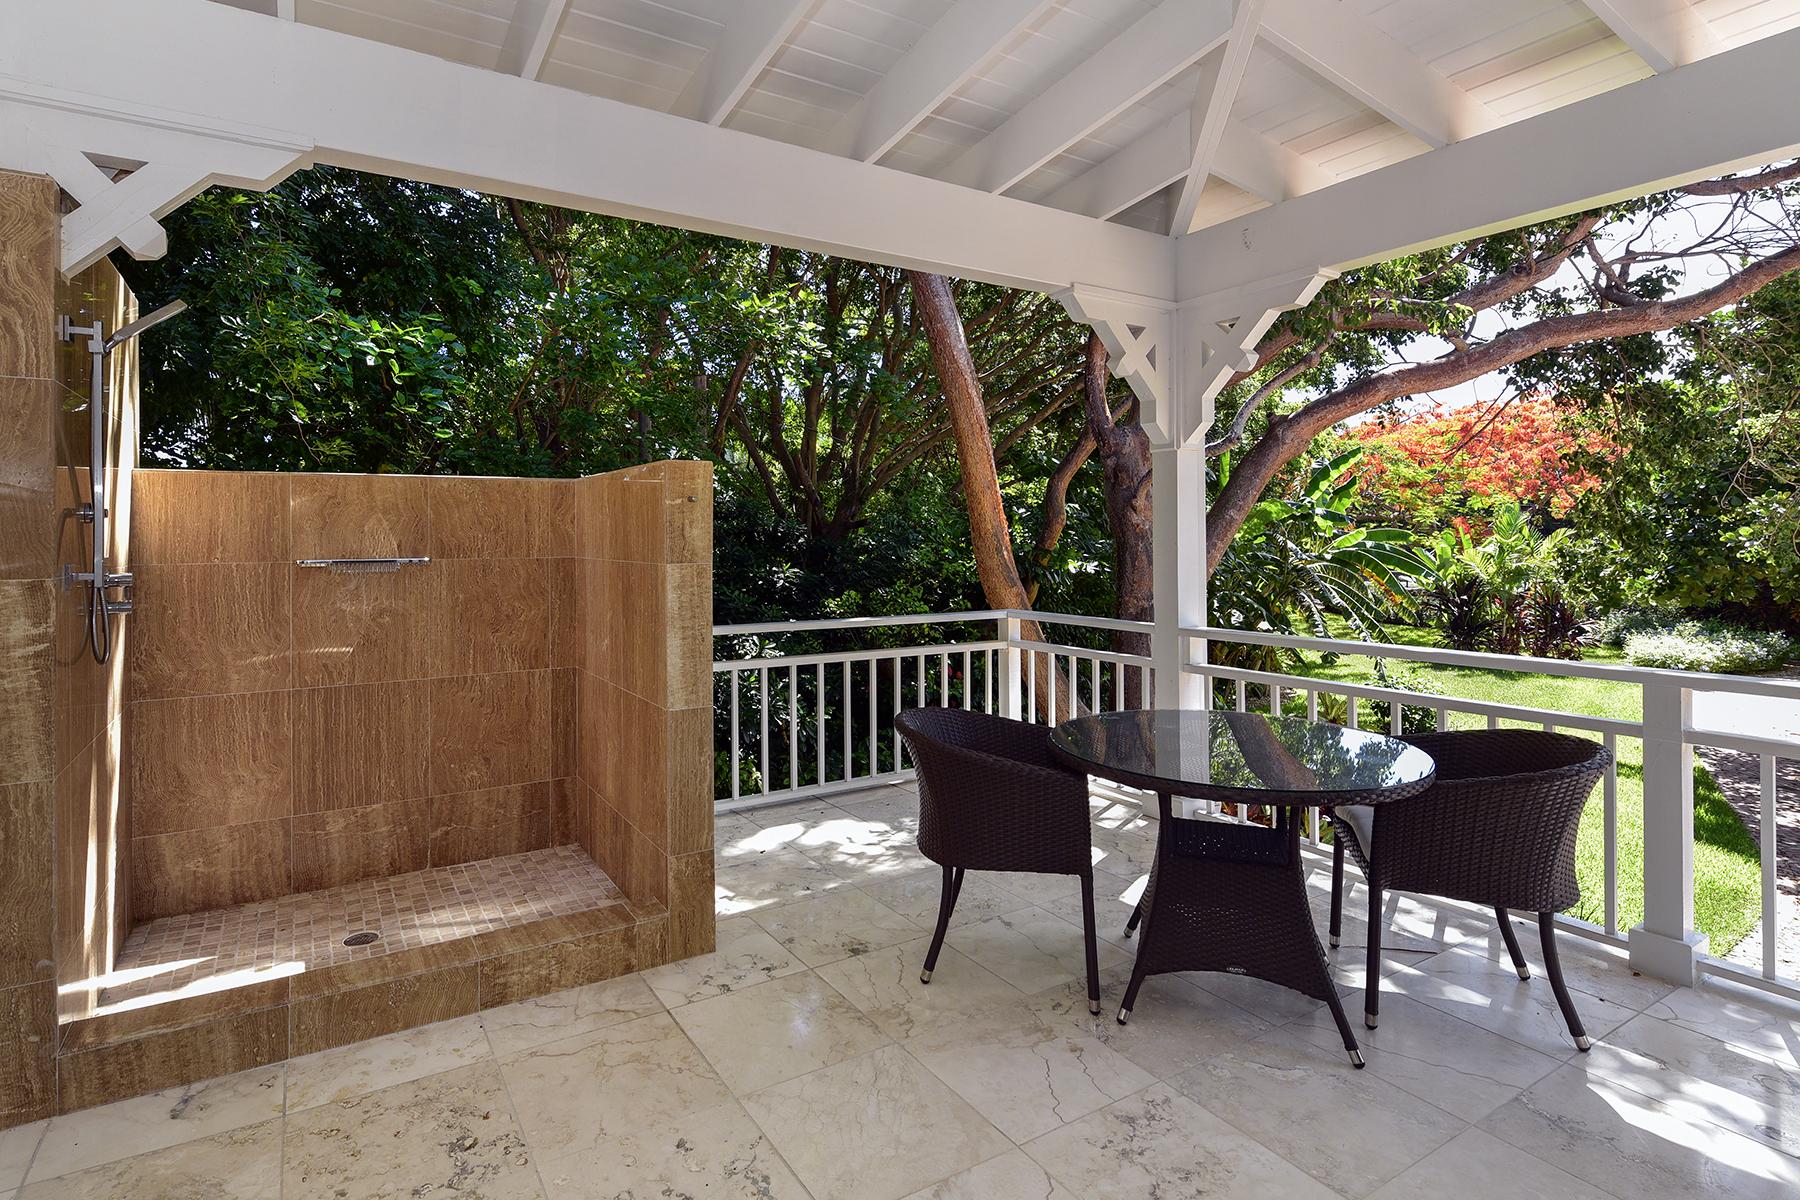 Additional photo for property listing at Villa Thenardier 89625 Old Highway Islamorada, Florida 33070 United States